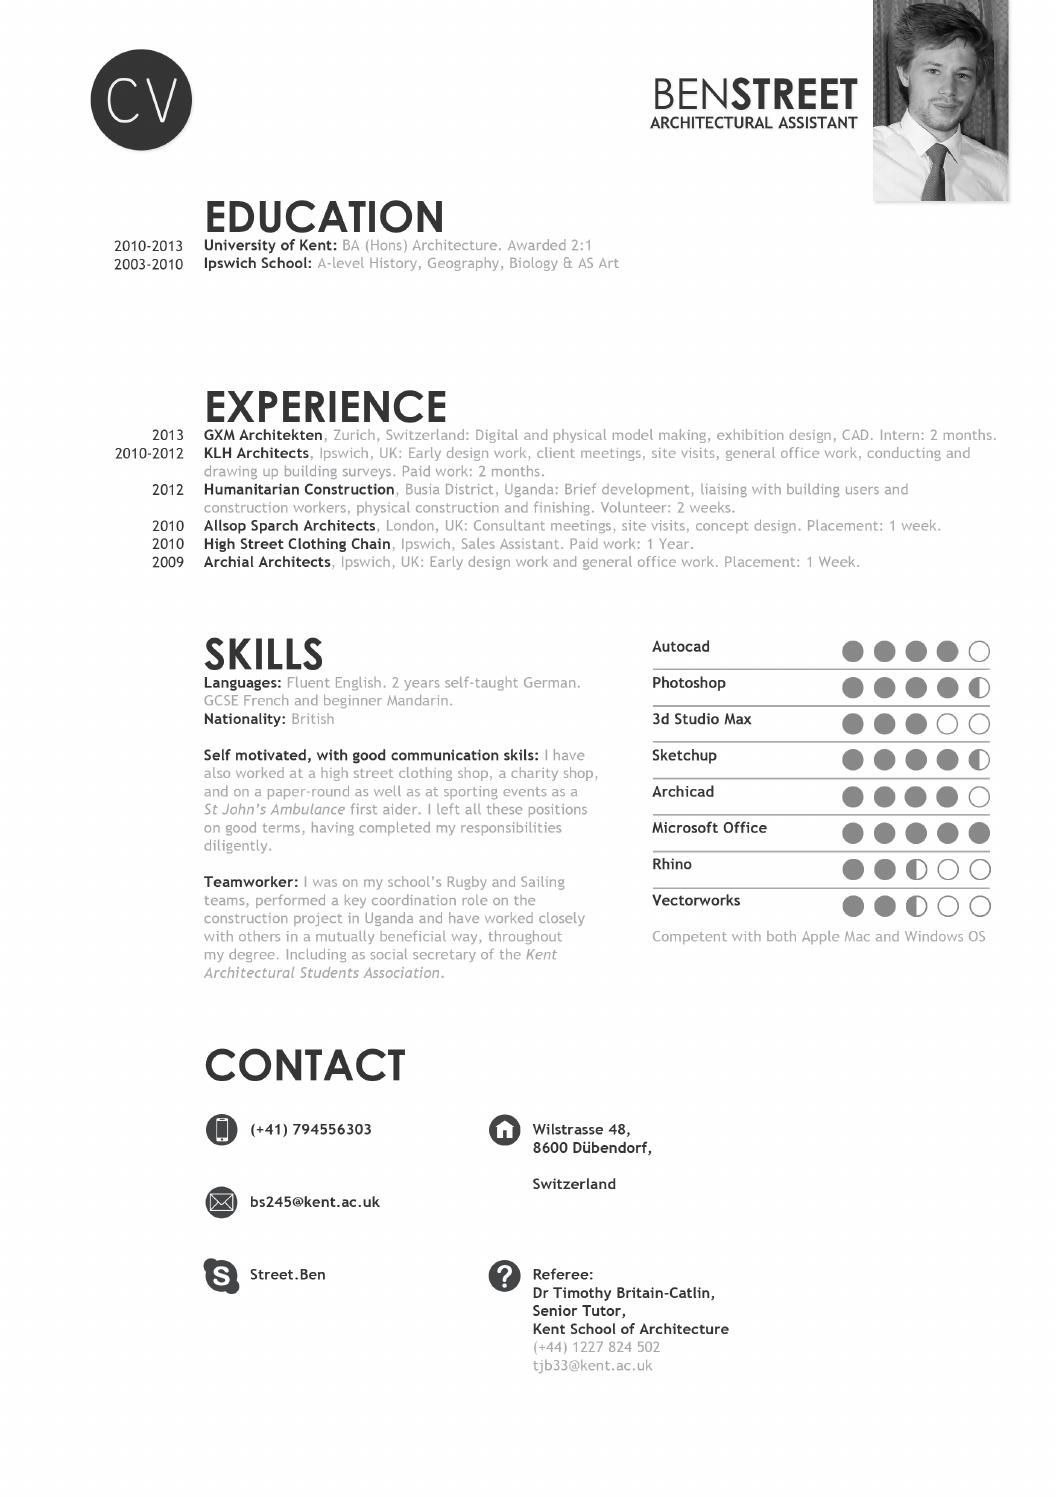 Ben Street Architecture Portfolio   Print Media   Pinterest   Lebenslauf